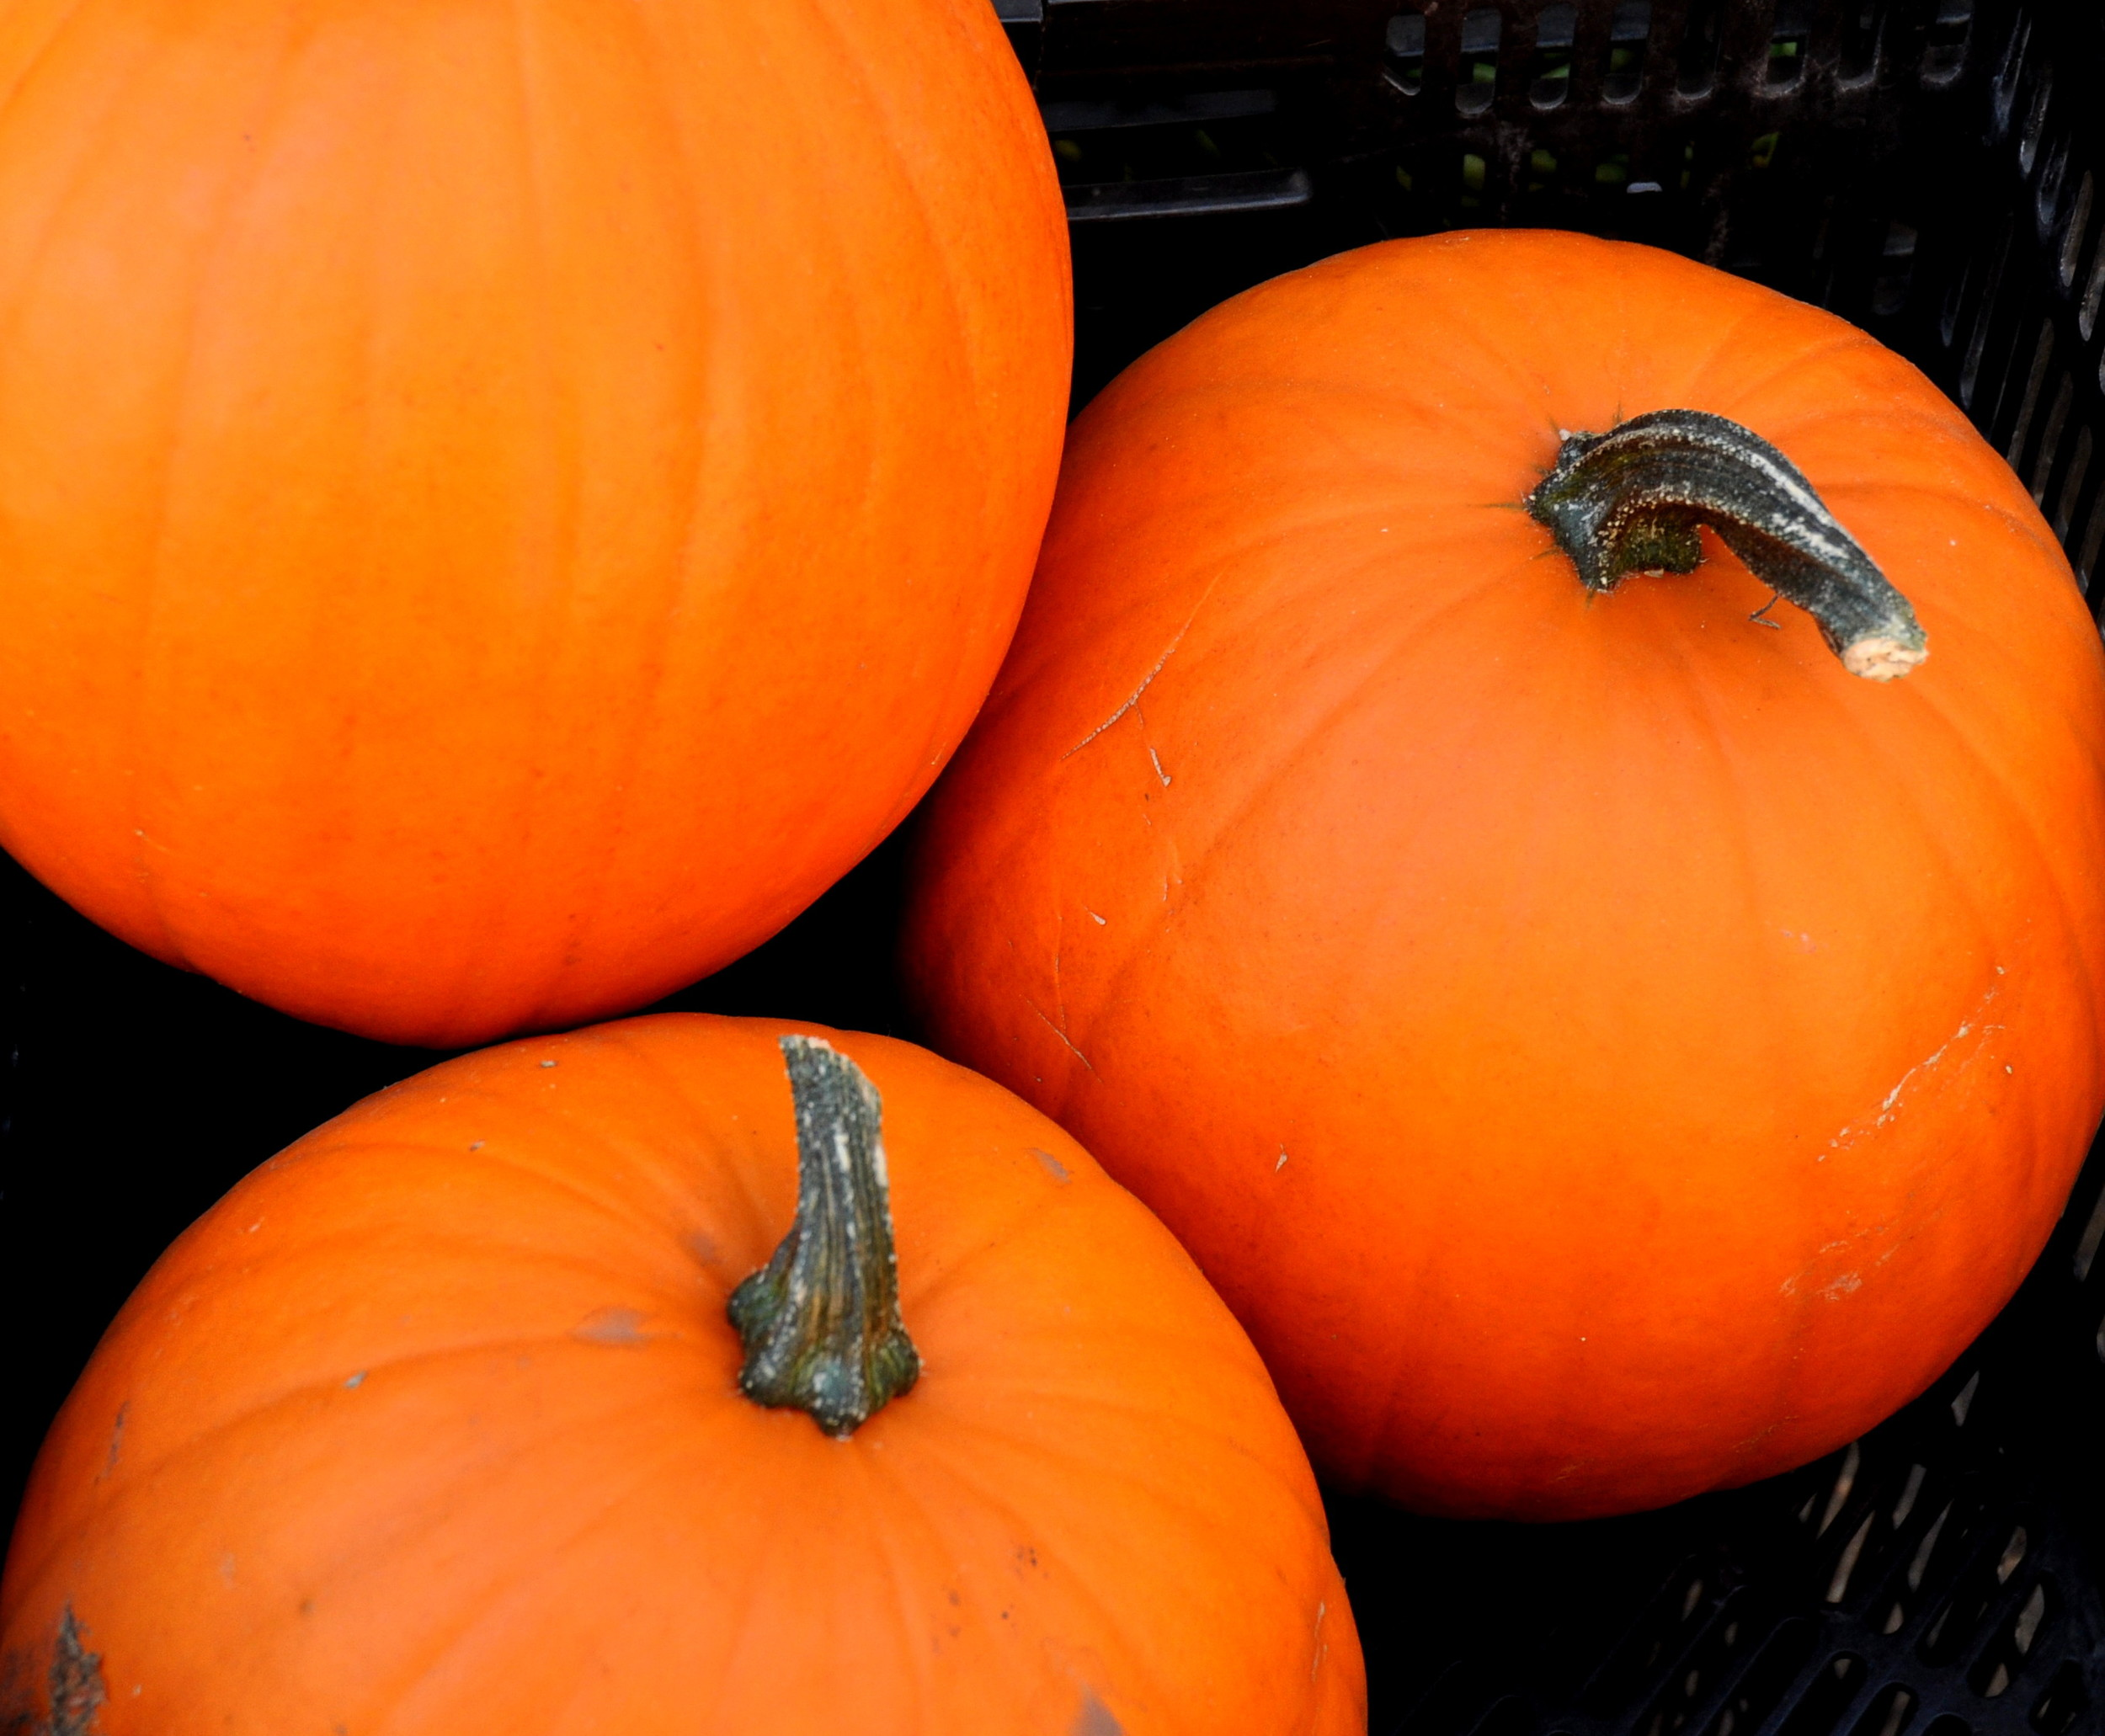 Jack-O-Lantern pumpkins from Stoney Plains Organic Farm at Ballard Farmers Market. Copyright Zachary D. Lyons.